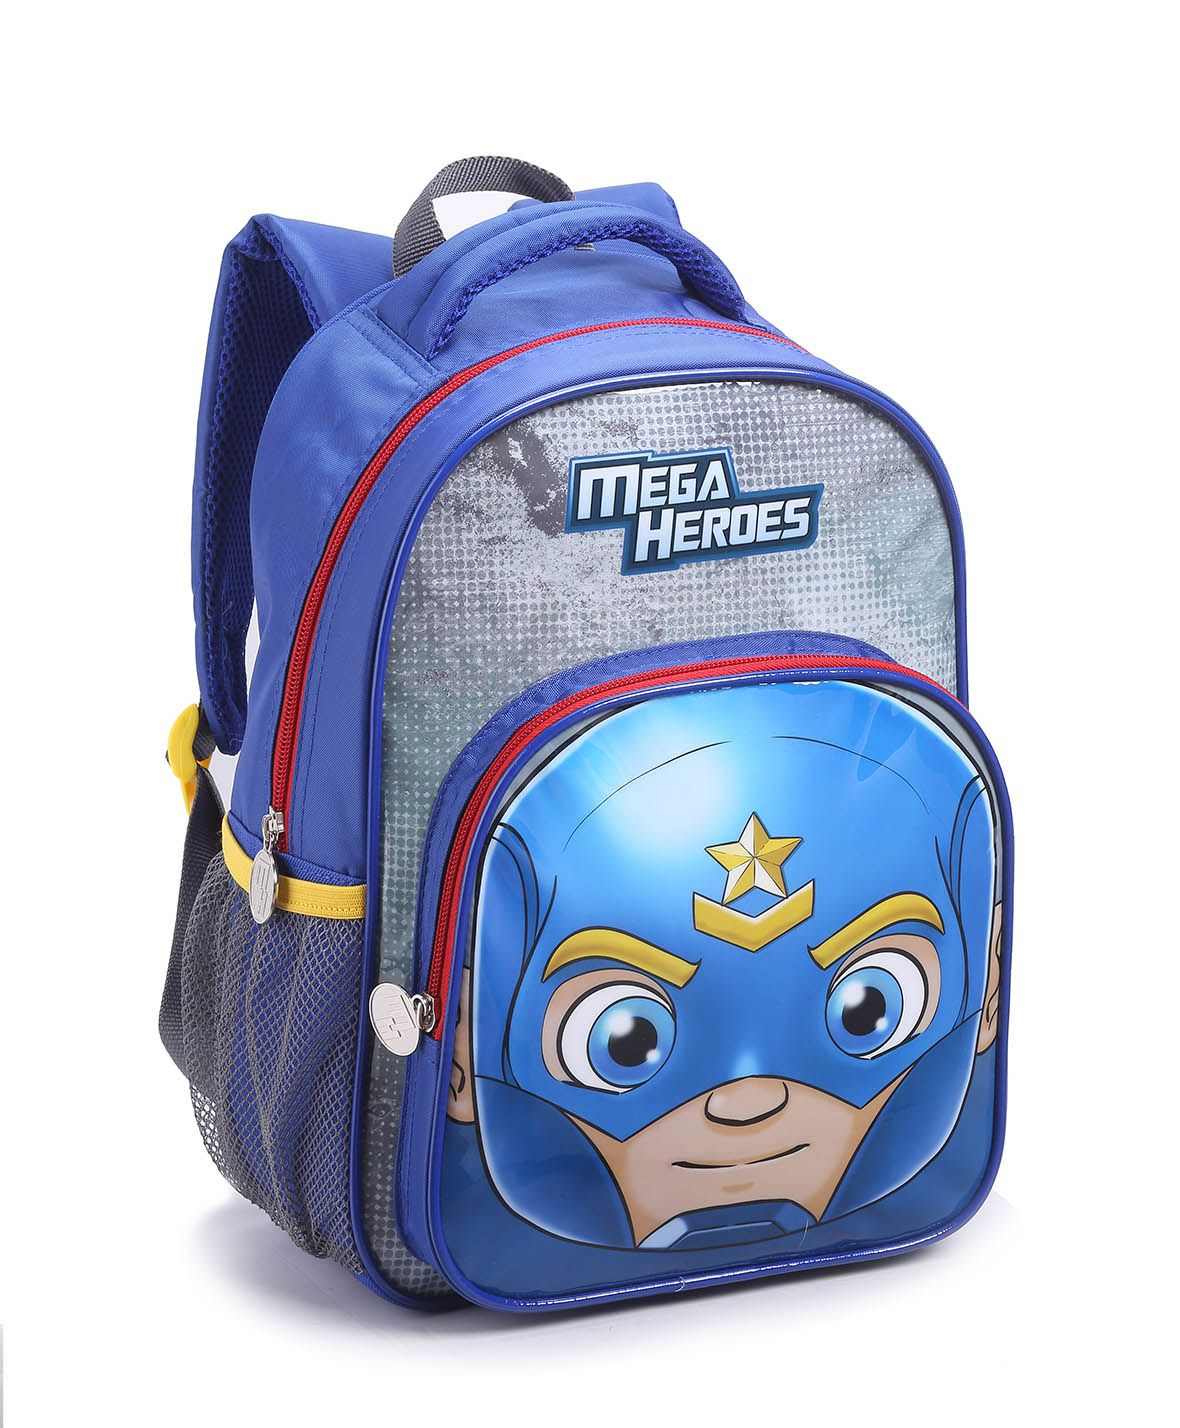 Mochila Infantil Menino Seanite 14486 Mega Heroes Azul